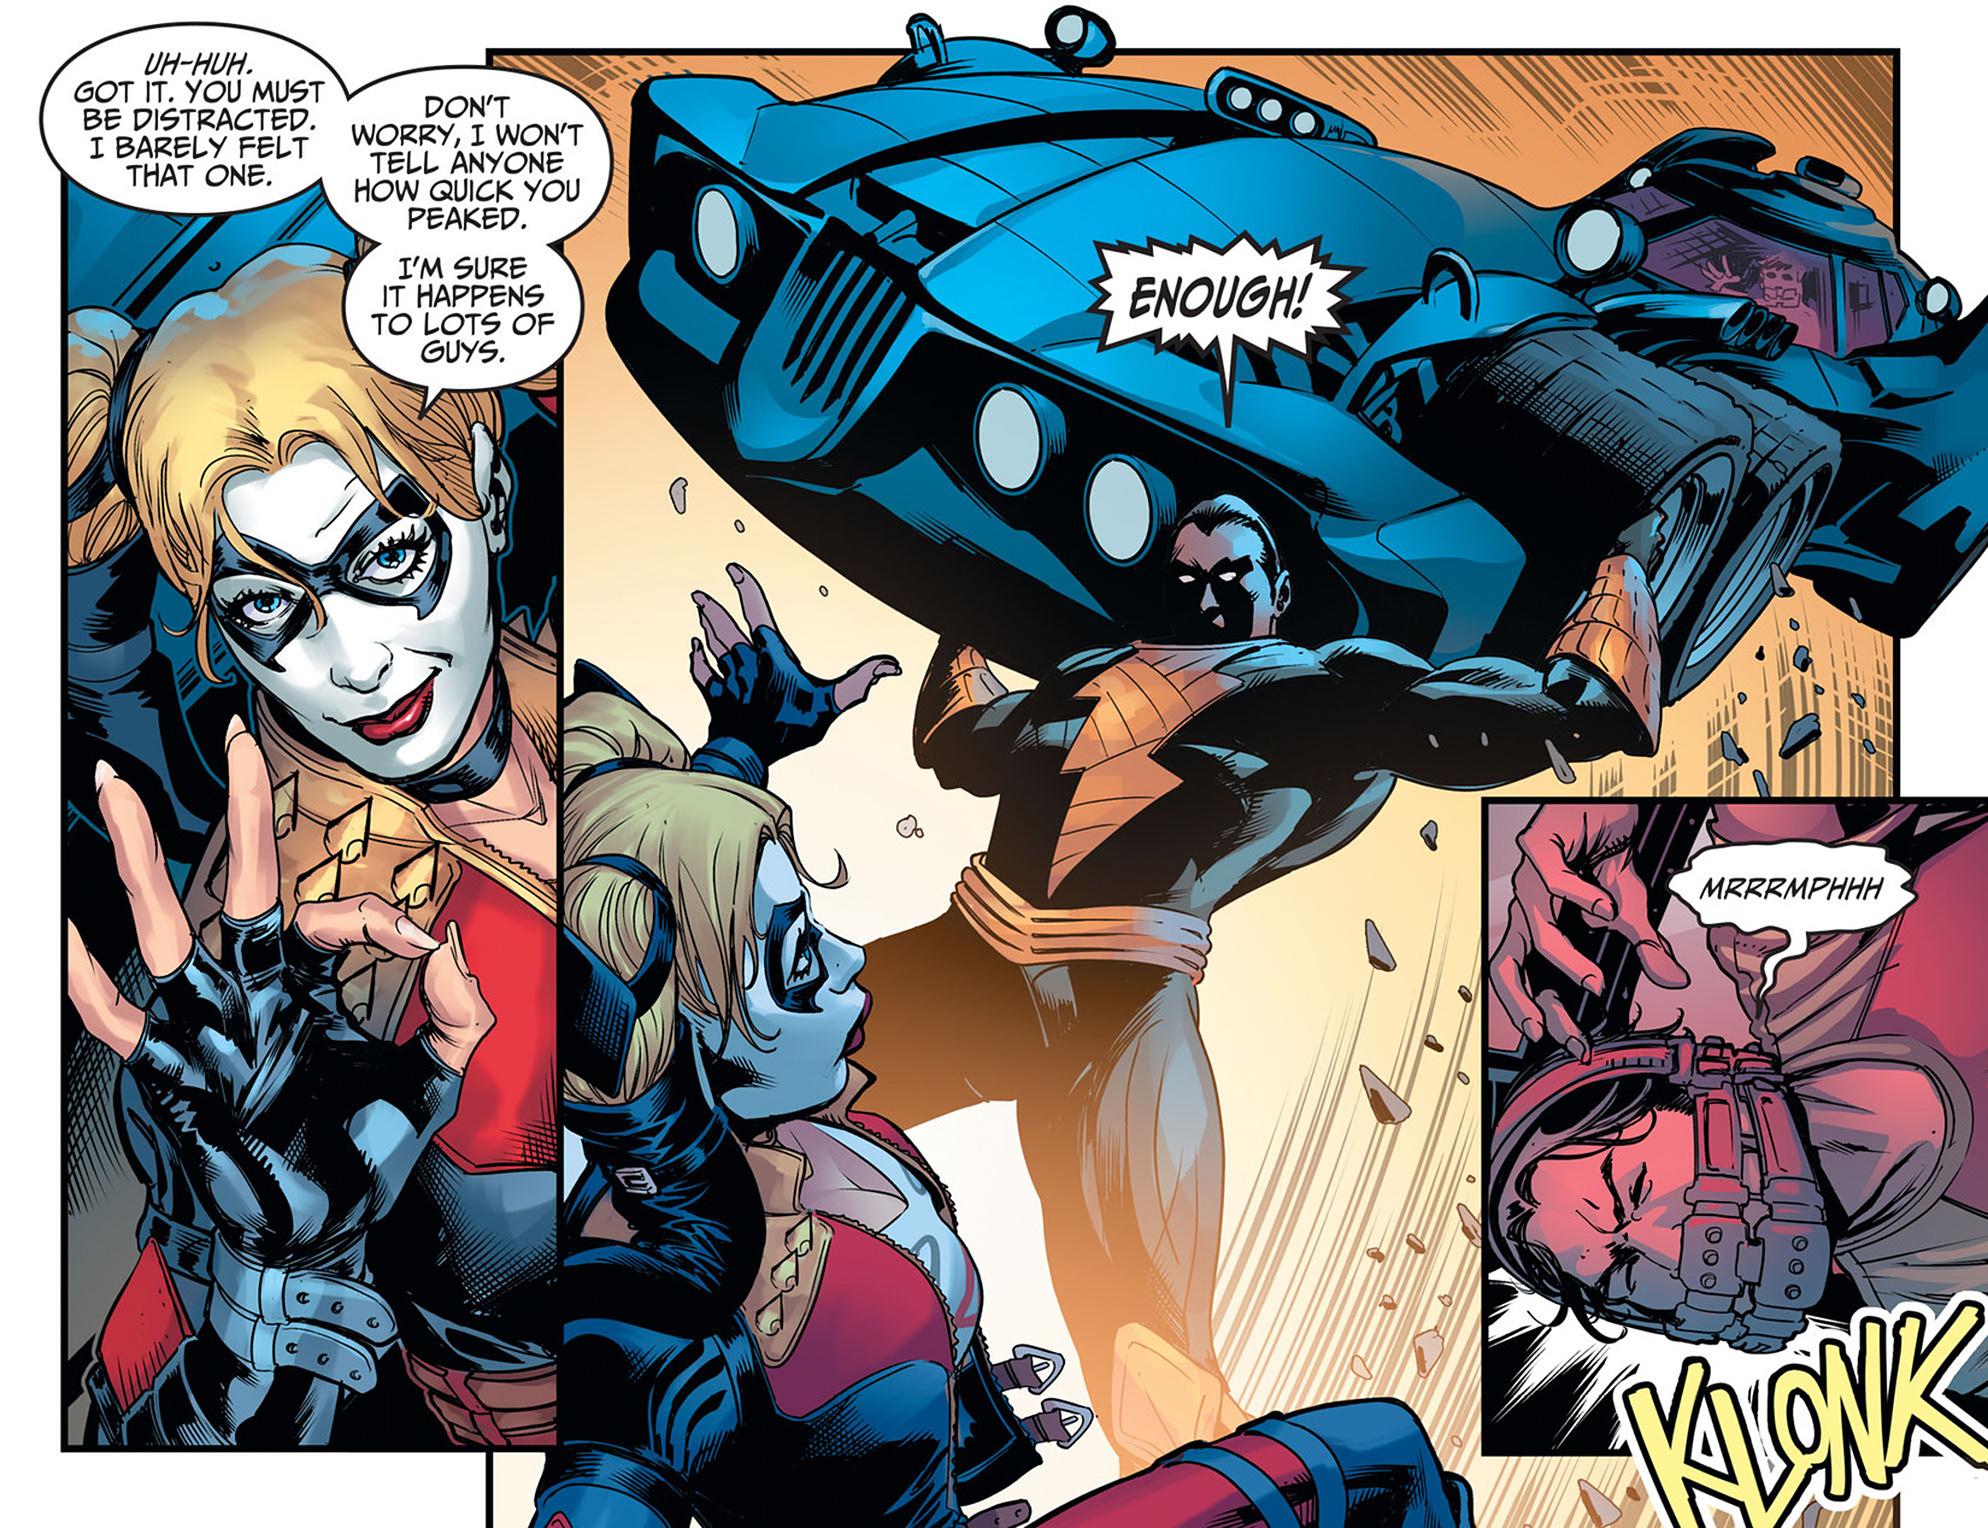 Read online Injustice: Ground Zero comic -  Issue #11 - 19